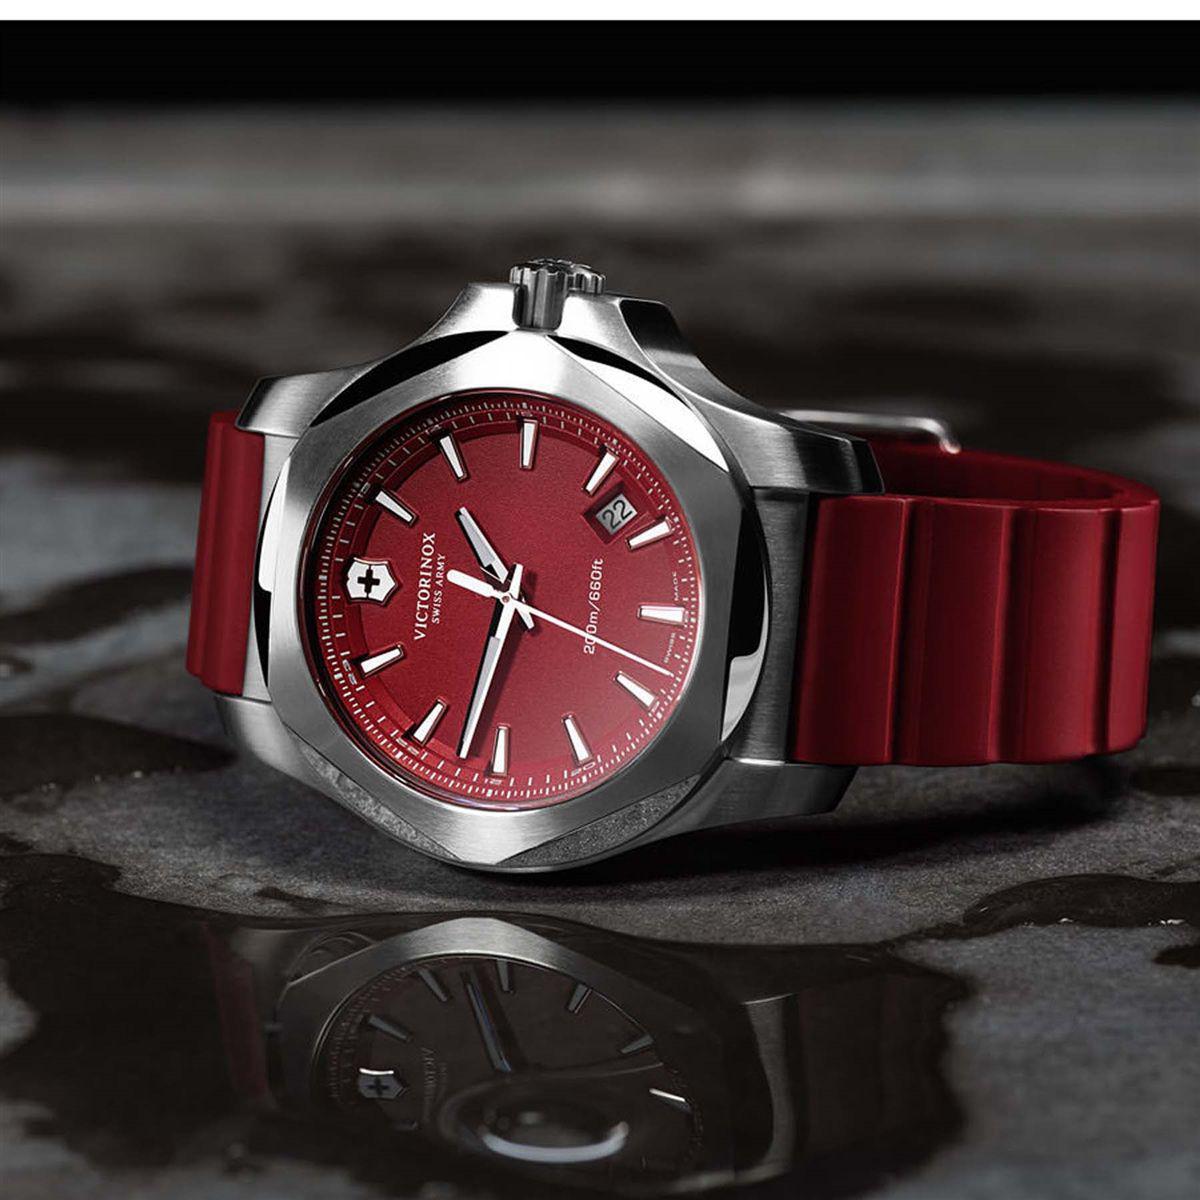 9dc55b98ed6 Relógio Victorinox Swiss Army I.N.O.X Red 241719.1 Produto não disponível